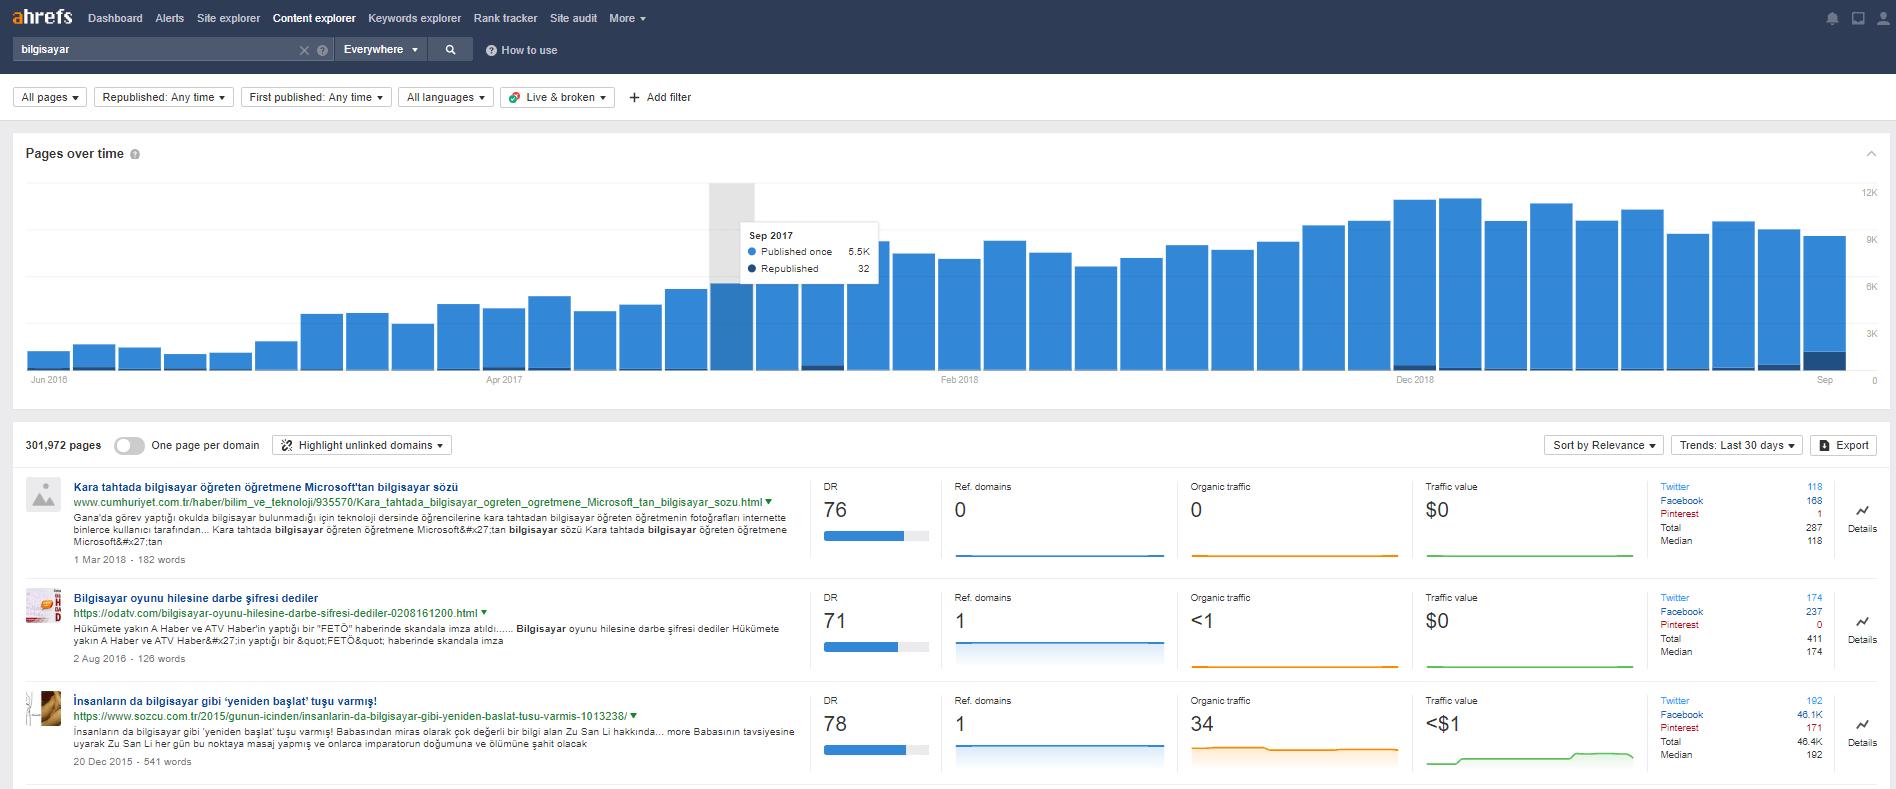 content-explorer